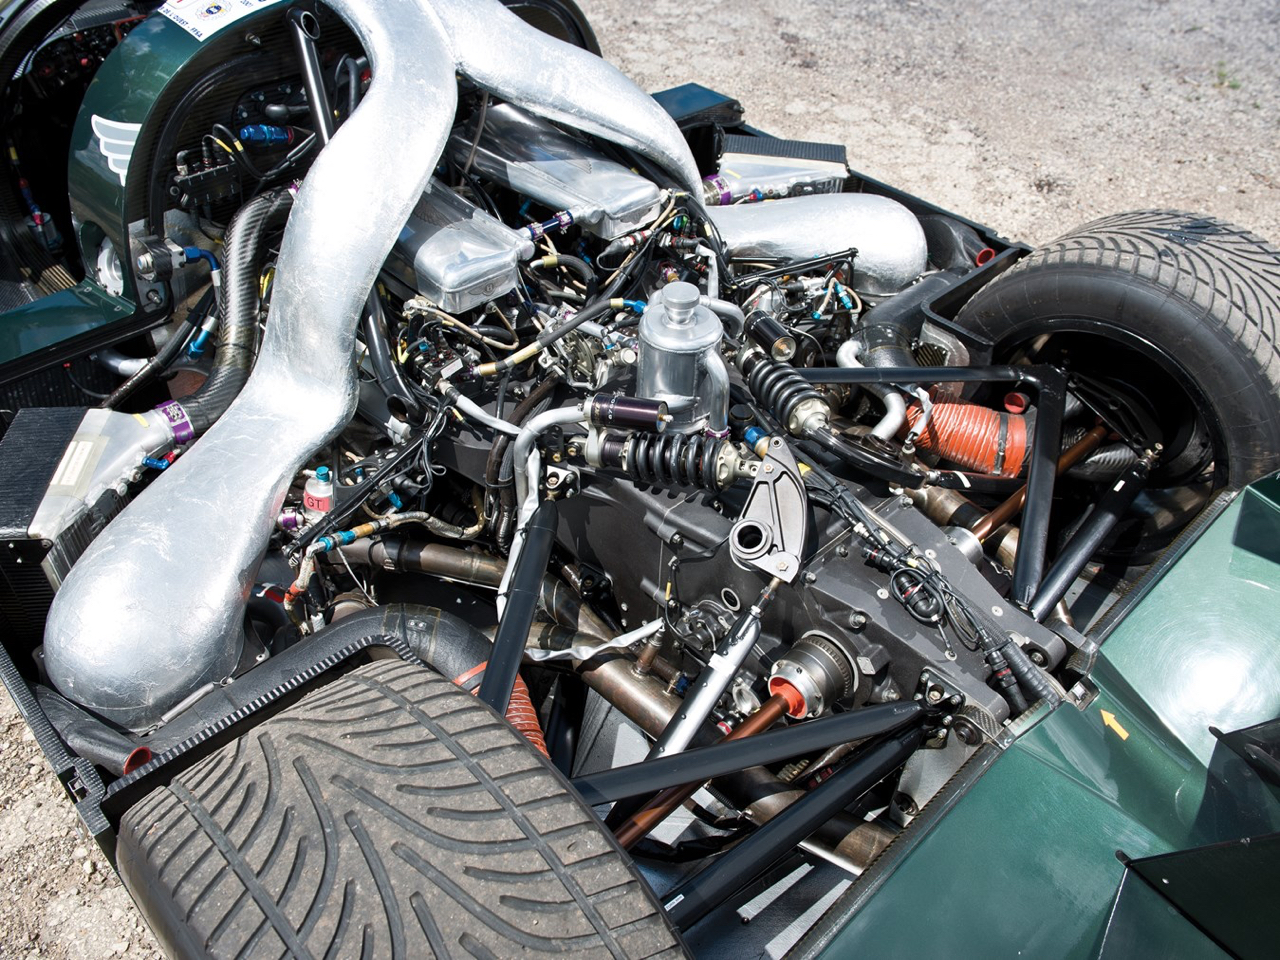 Engine Sound : Bentley Speed 8 - 3 années pour 1 victoire ! 11